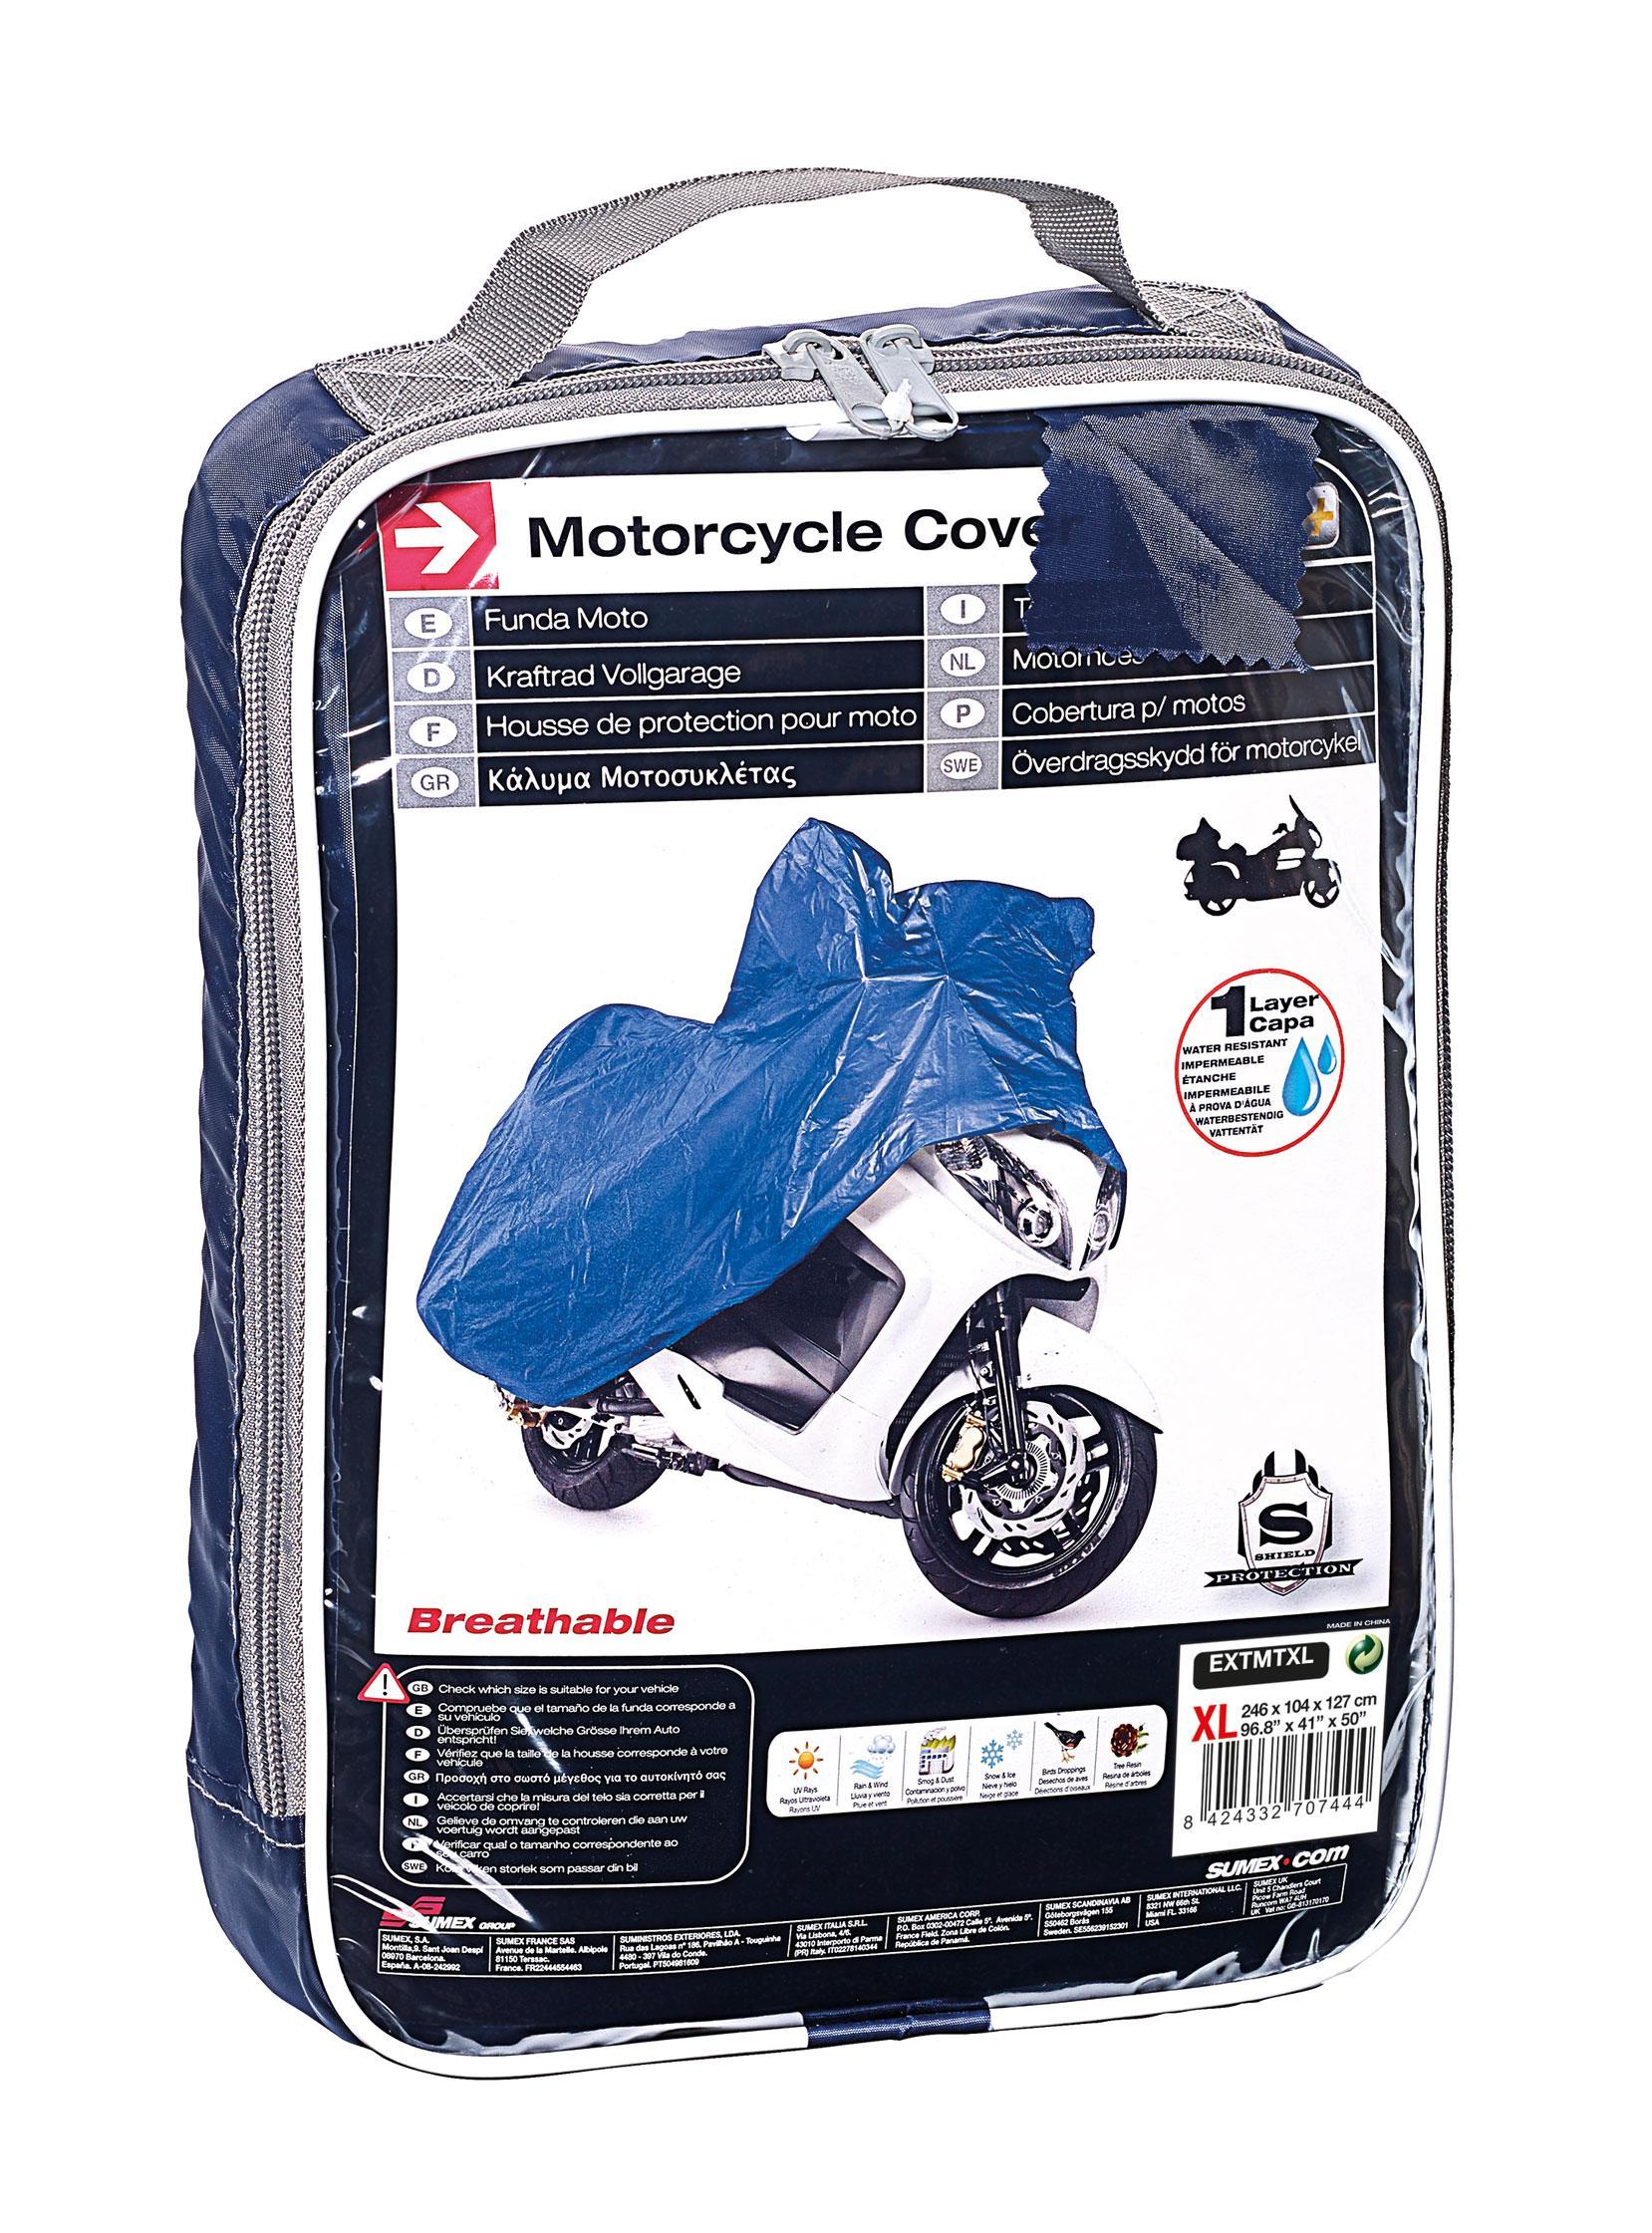 Housses de protection adnautomid moto xl 246x104x127 for Housse protection moto